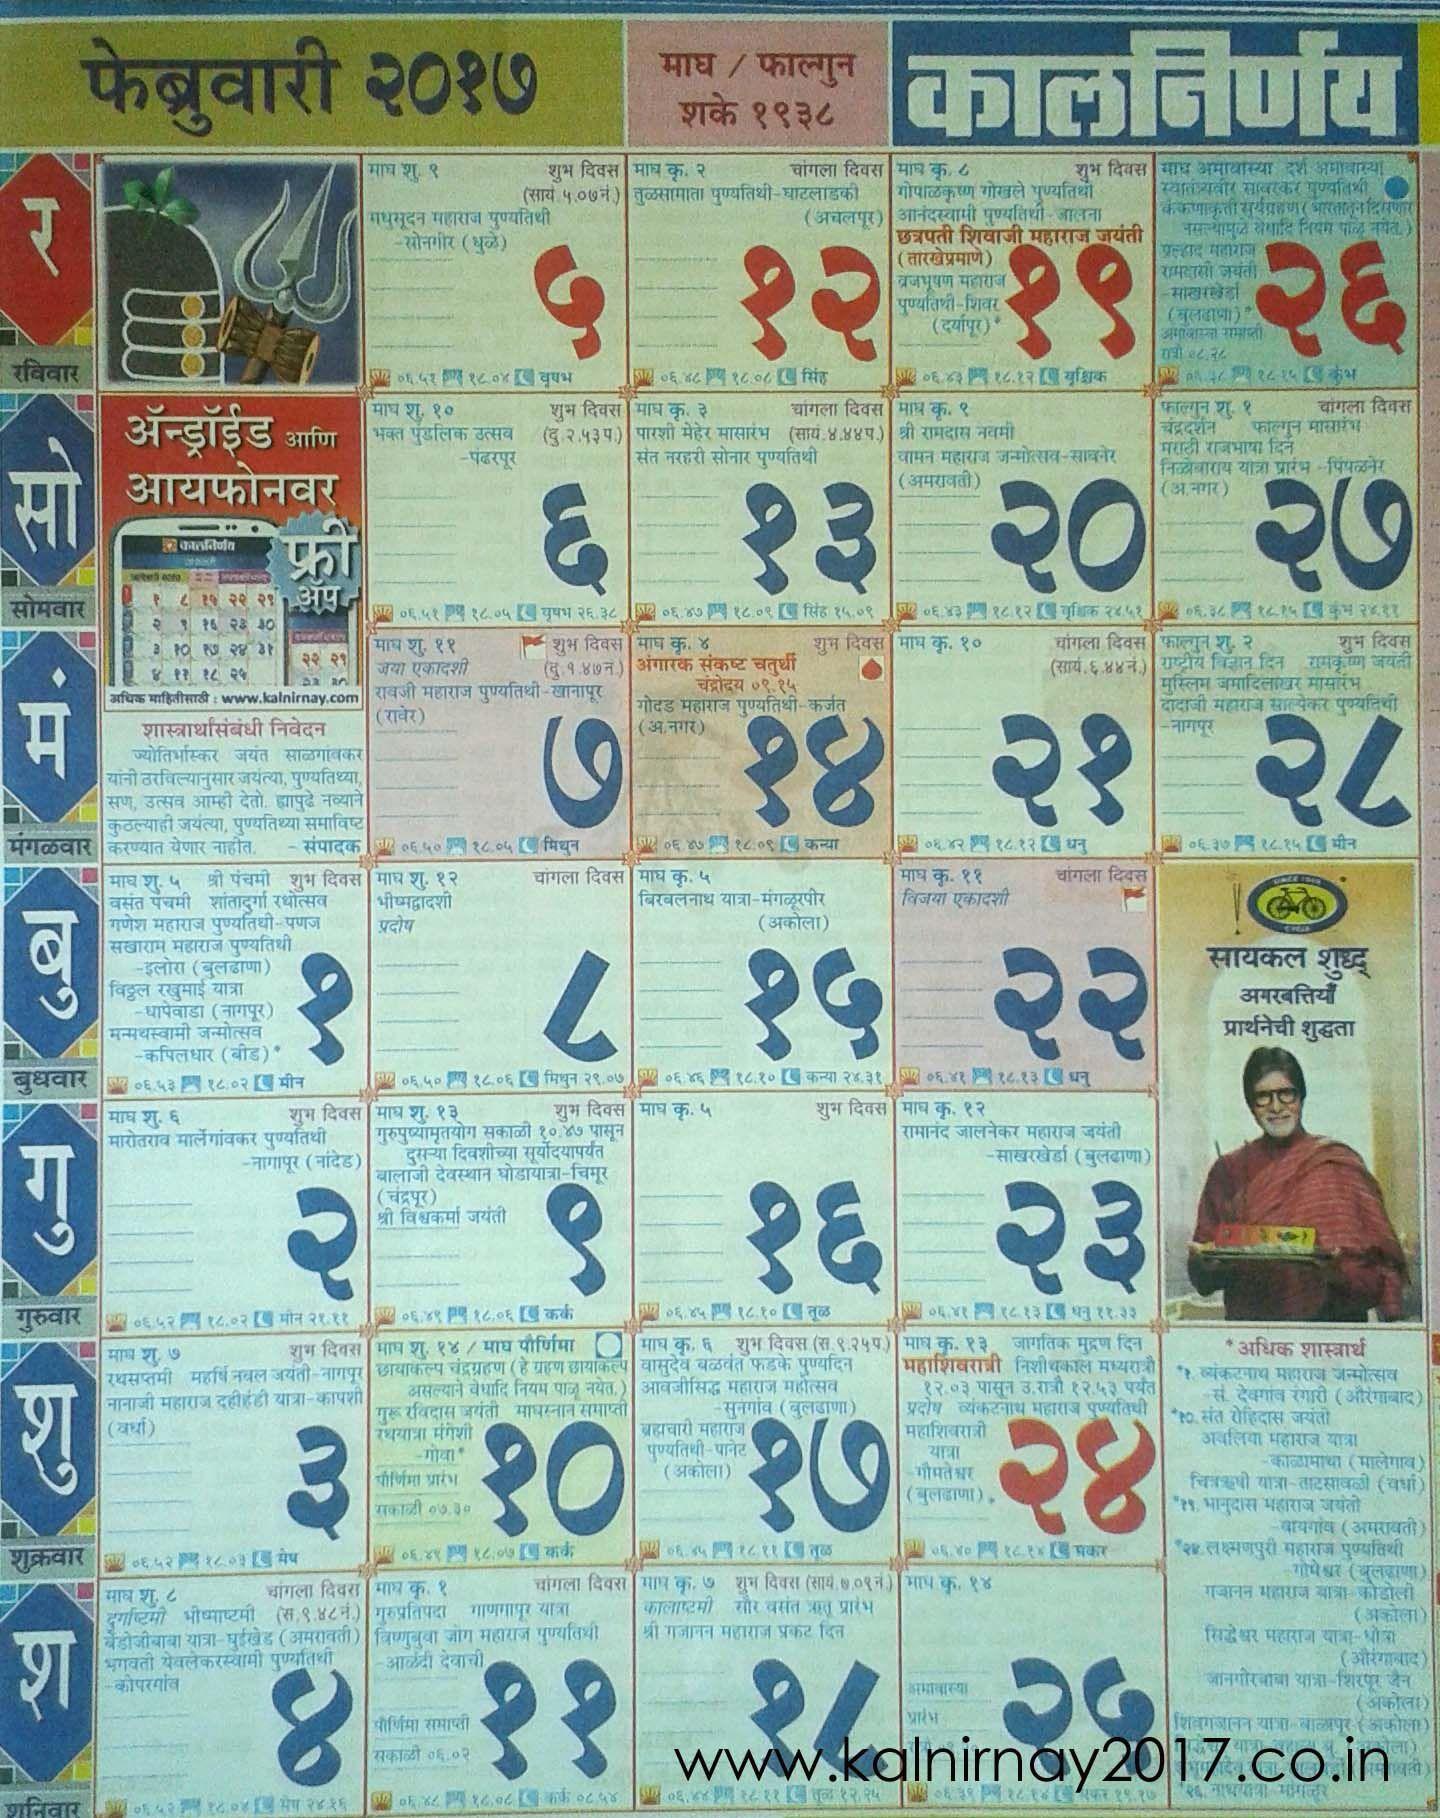 February Month Marathi Kalnirnay Calendar 2017 For More Calendar See Www Onlinecalendars In 2019 Calendar Calendar 2017 Calendar Template